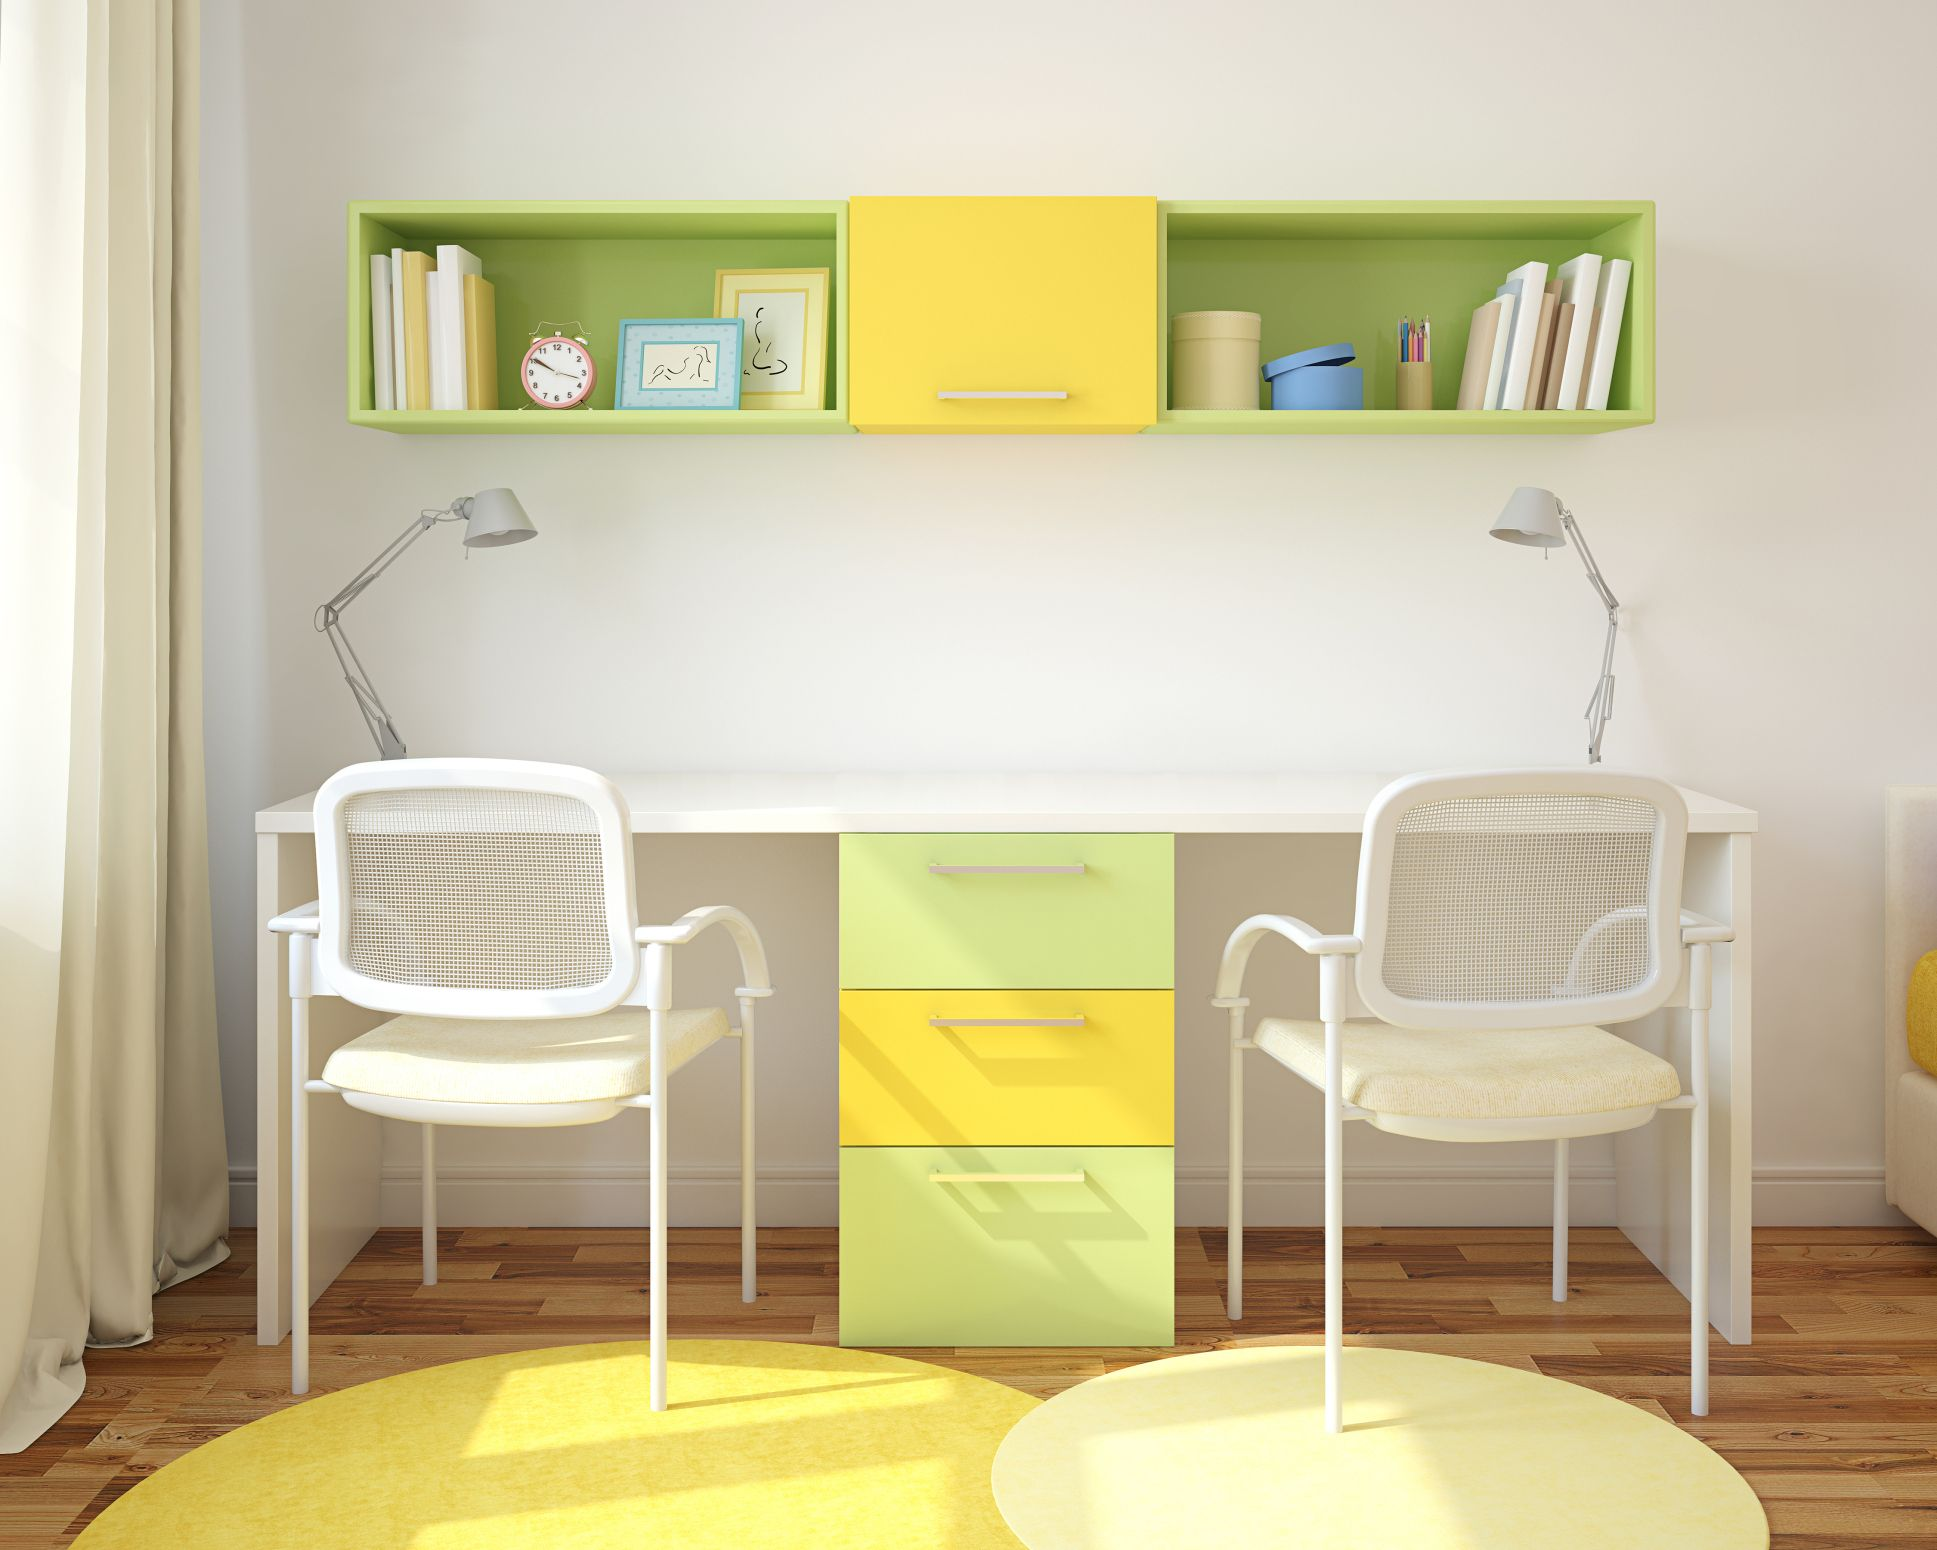 Standard Heights For A Shelf Above A Desk Hunker Shelves Above Desk Office Supplies Design Home Office Decor